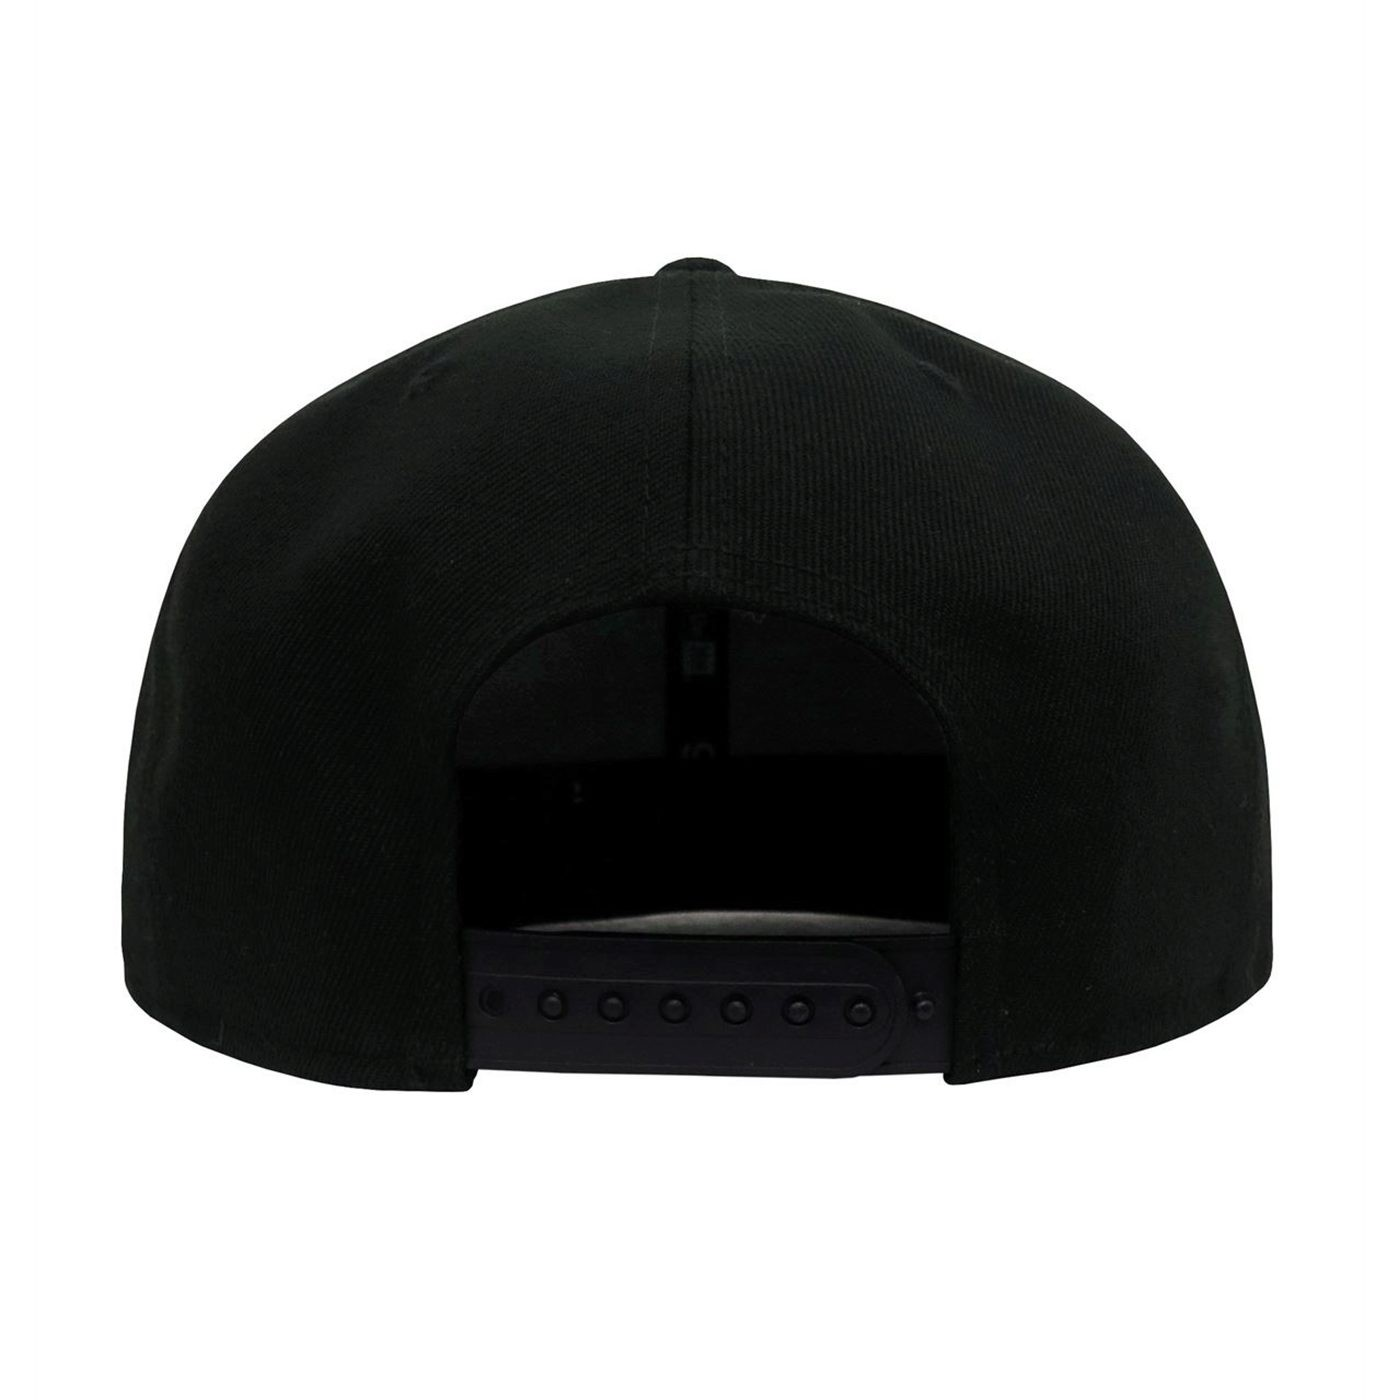 Star Wars 40th Anniversary Logo 9Fifty Adjustable Hat